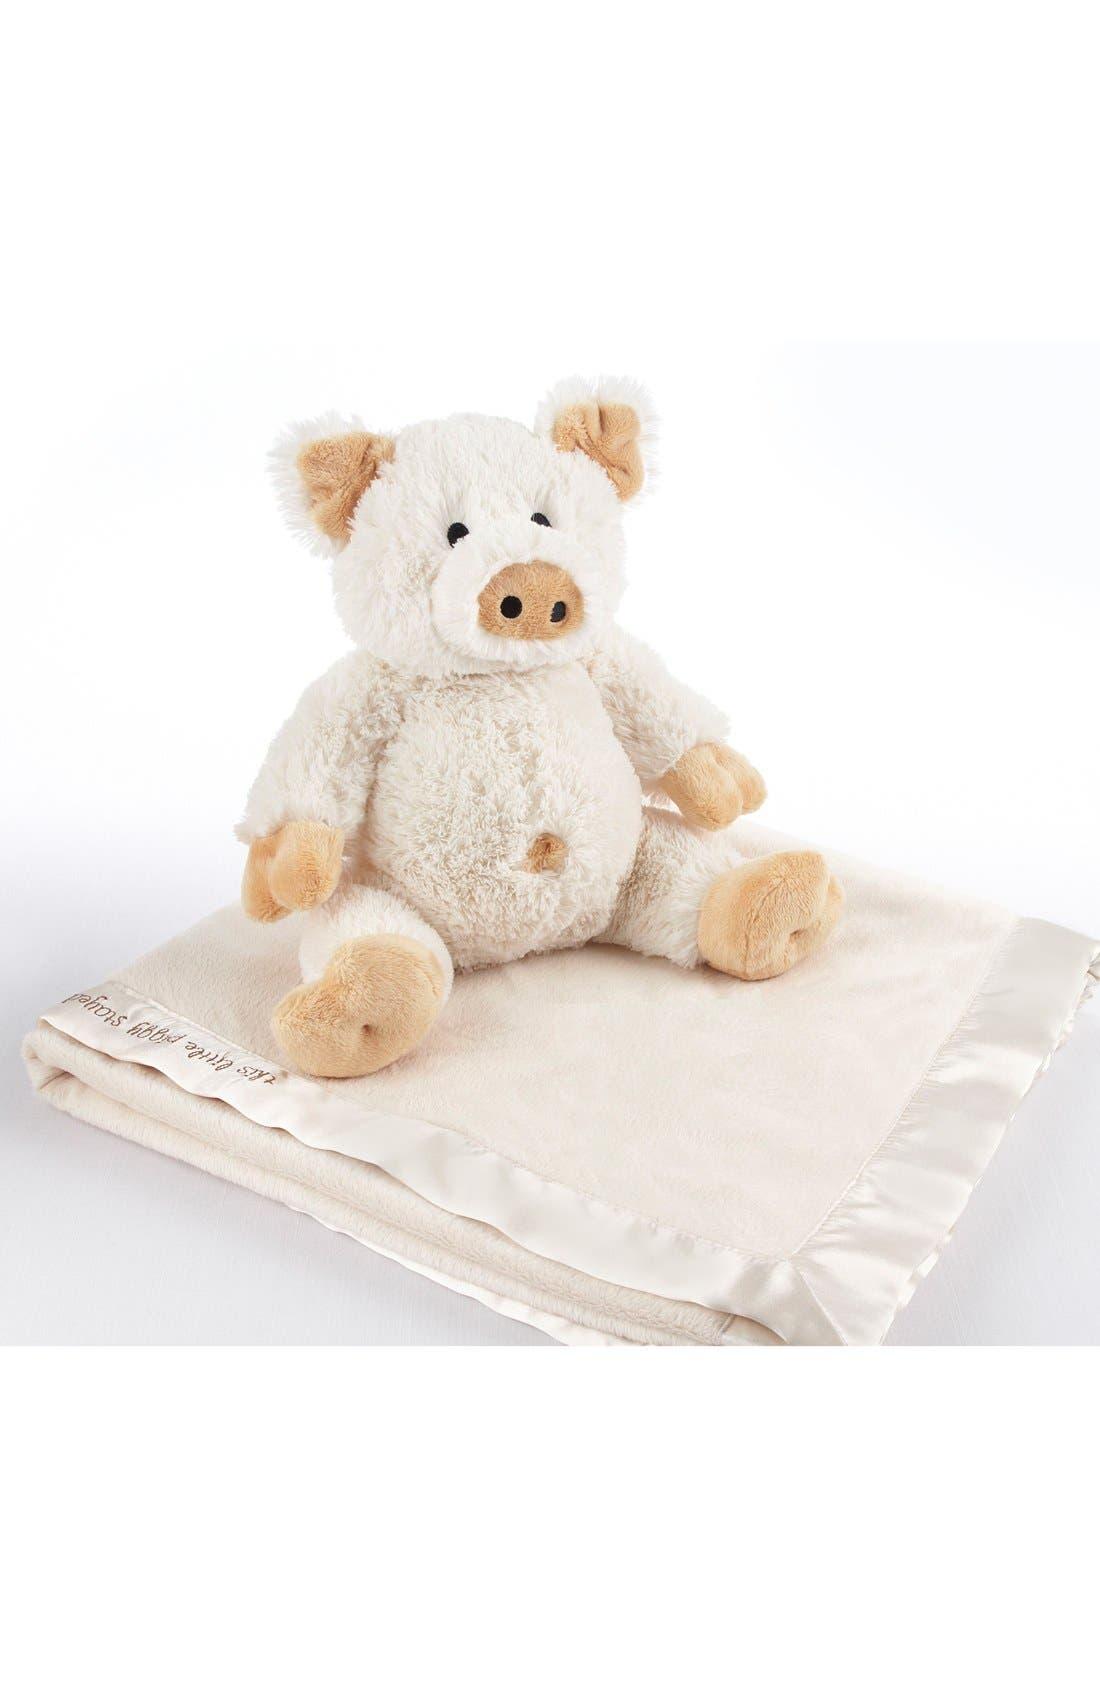 Alternate Image 1 Selected - Baby Aspen Pig Stuffed Animal & Blanket Set